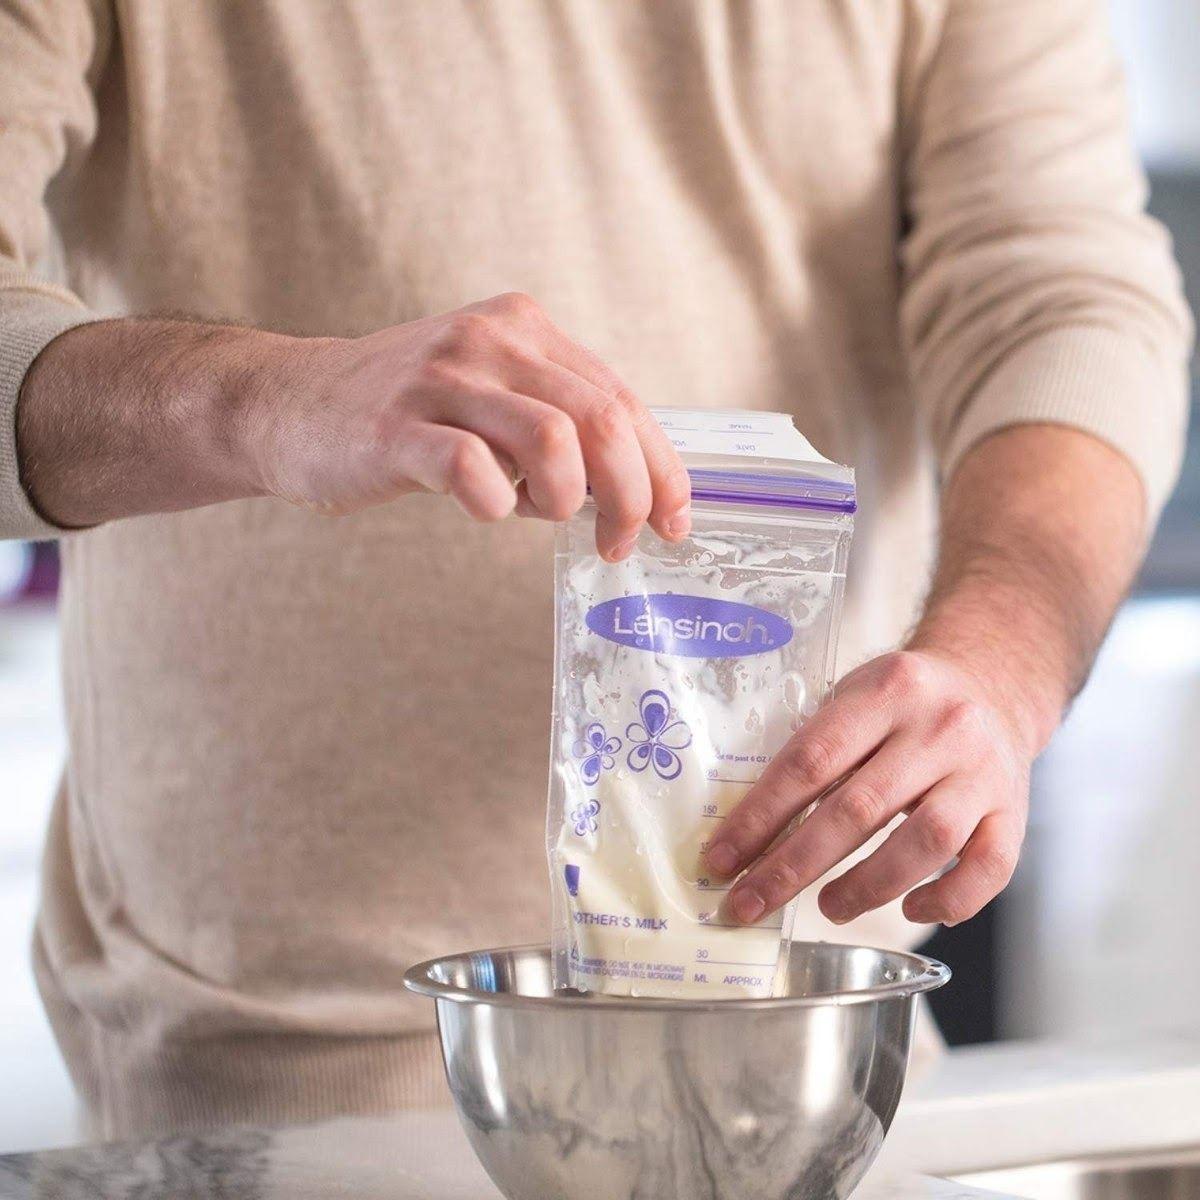 Túi trữ trữ sữa Lansinoh